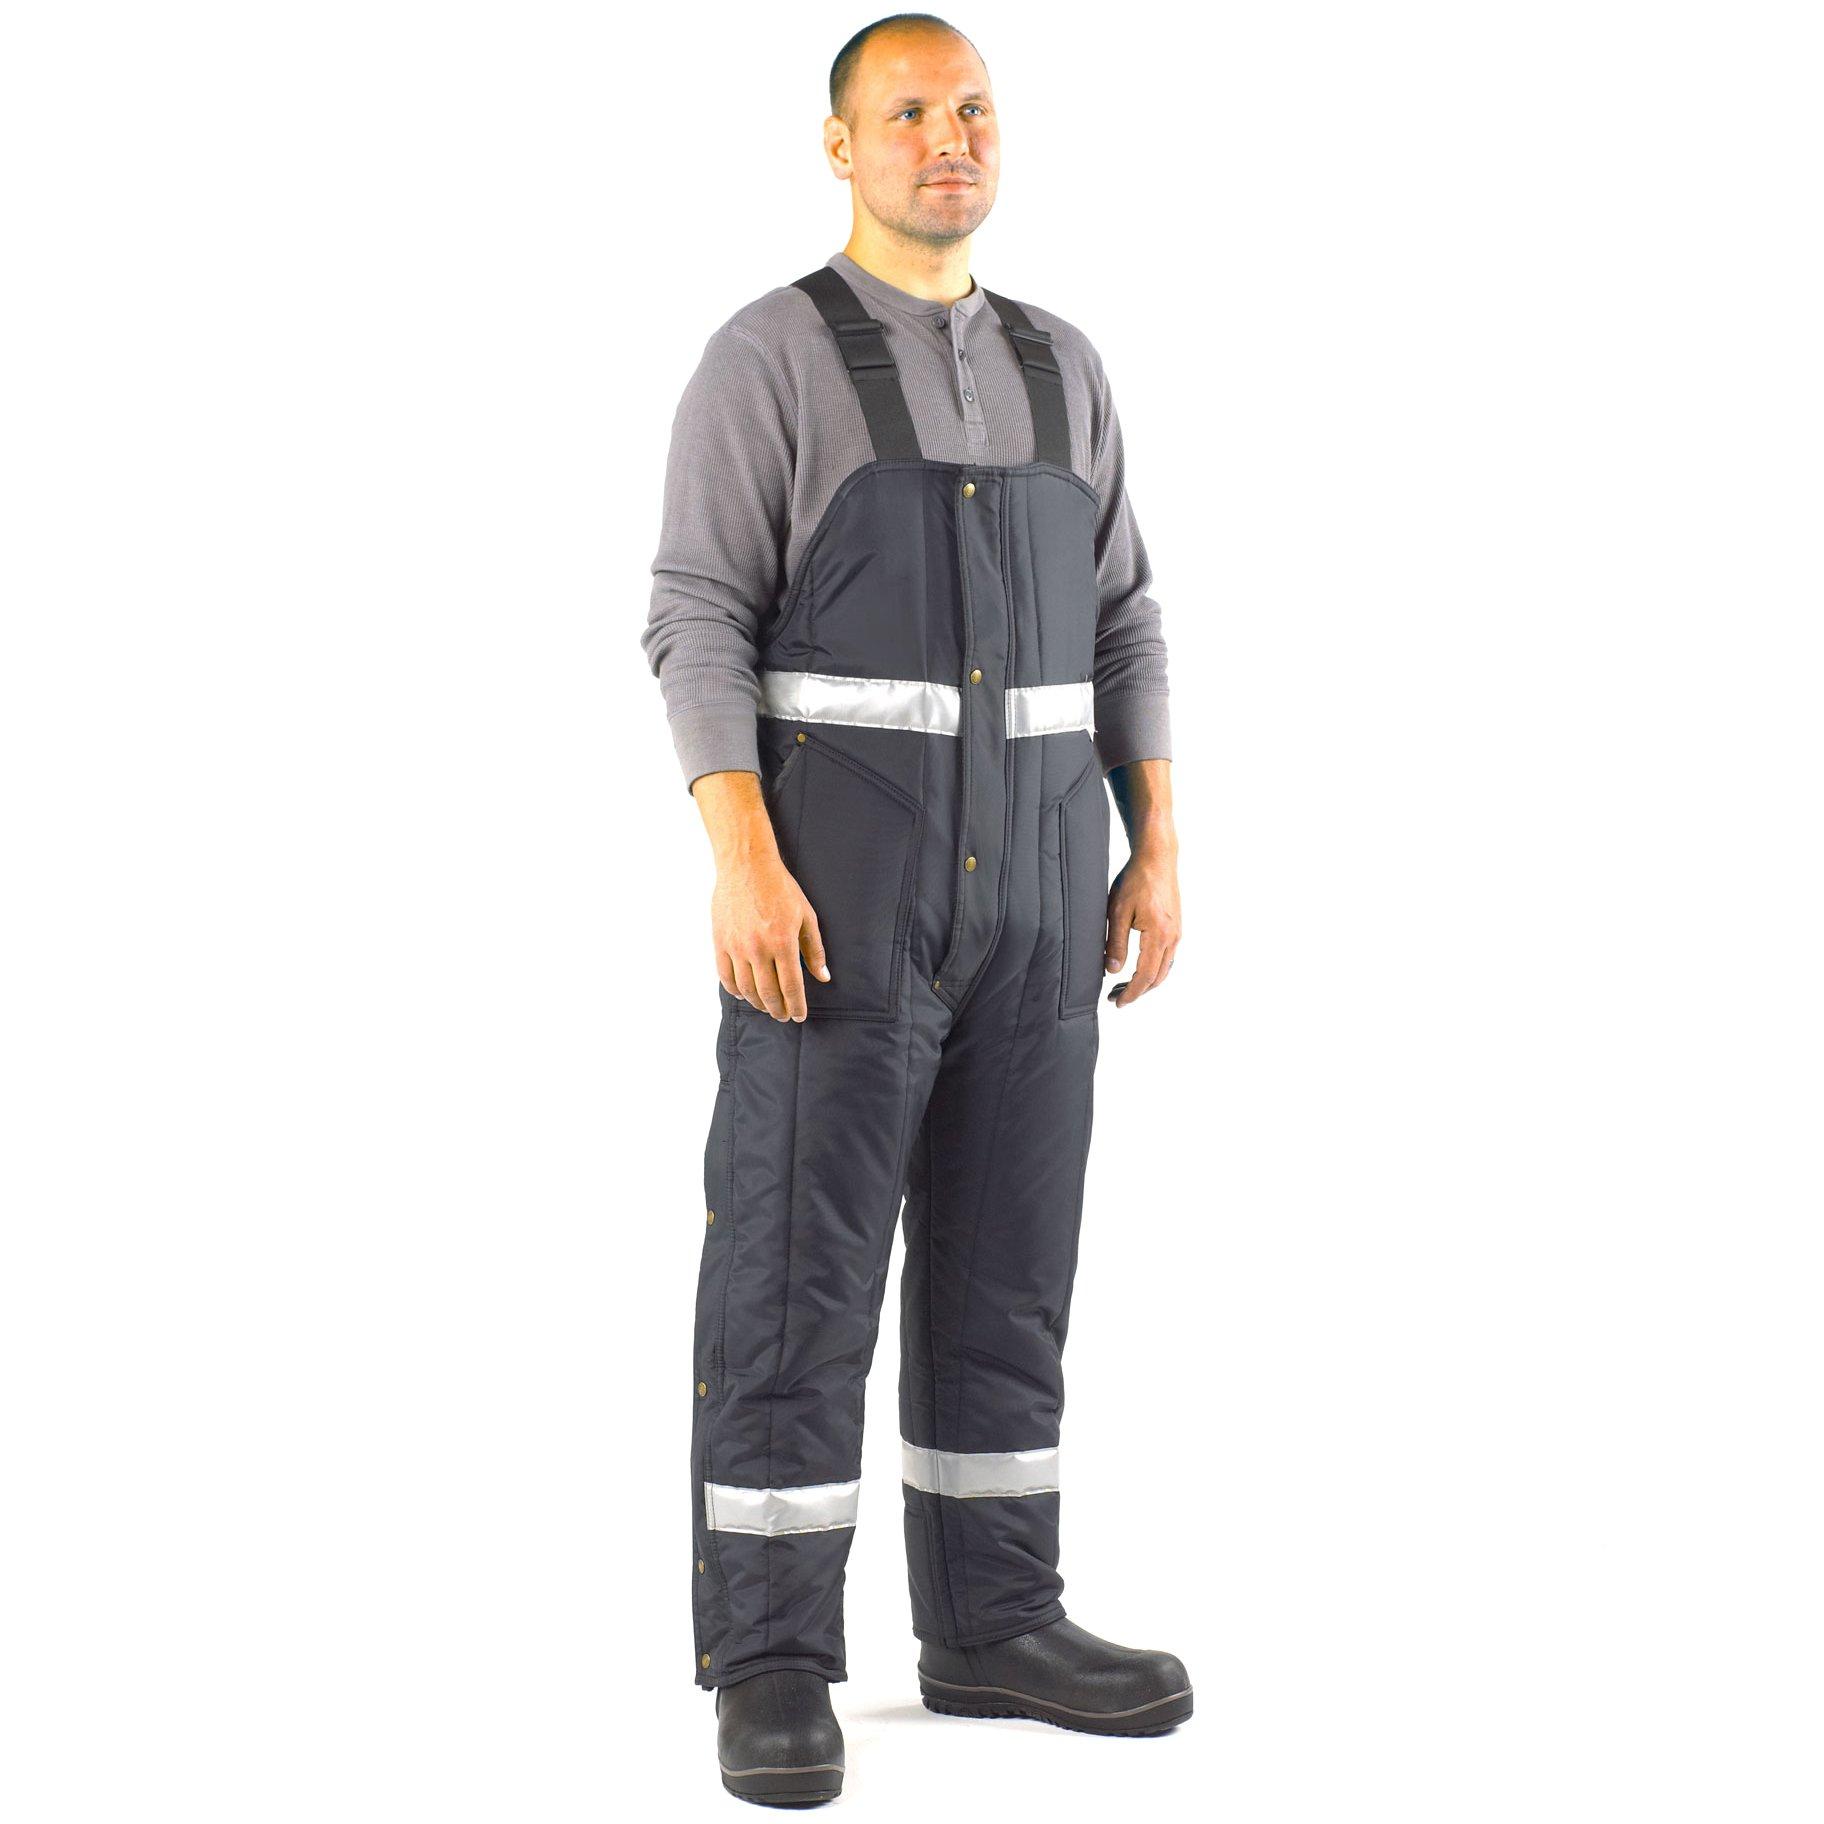 RefrigiWear Men's Iron-Tuff Enhanced Visibility High Bib, Navy, 3XL Short by Refrigiwear (Image #3)